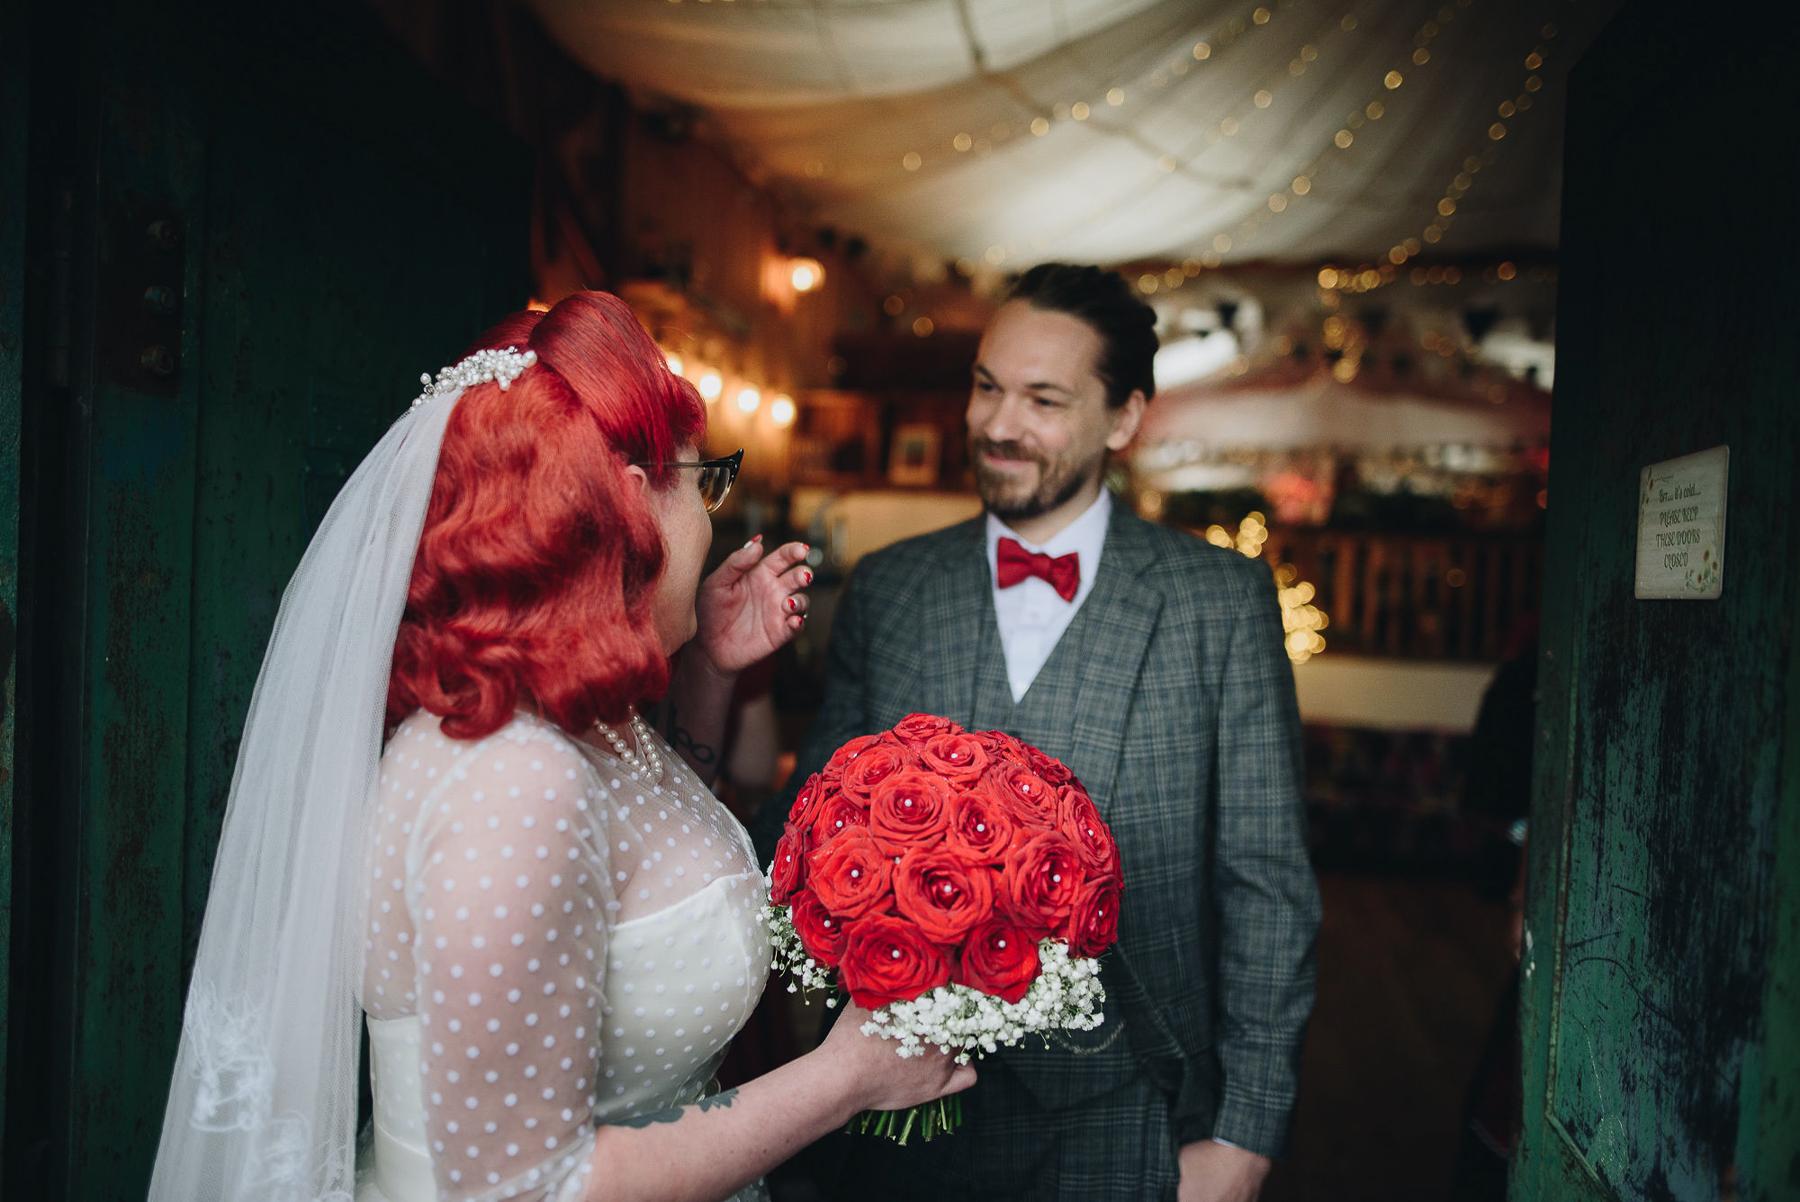 Wellbeing_Farm_Wedding_Photography_The_Pin-Up_Bride_Lara_Shaun-45.jpg